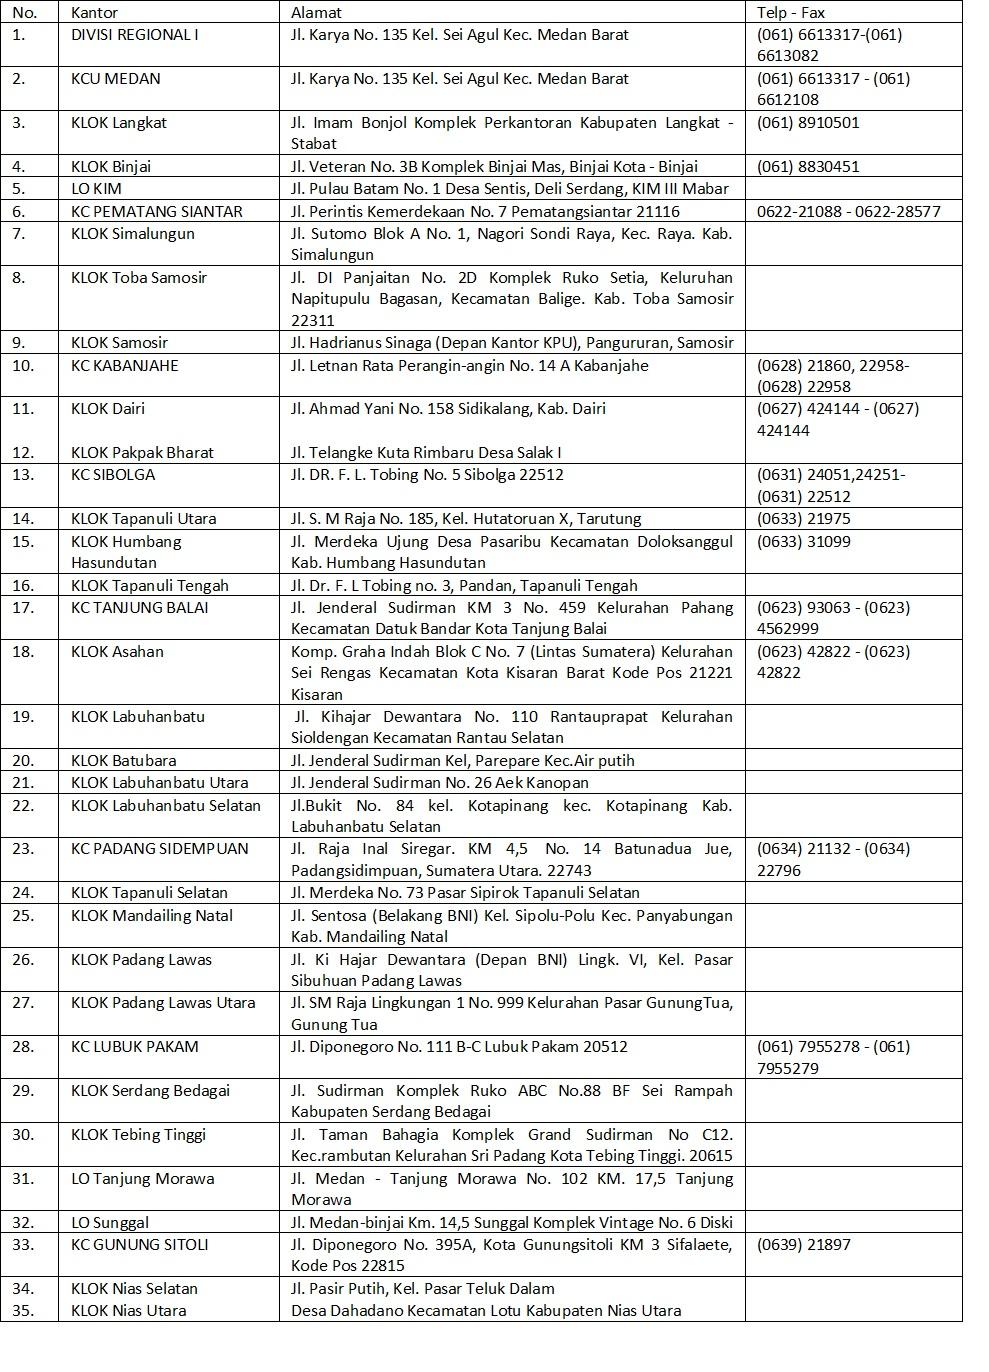 Daftar BPJS Sumut all